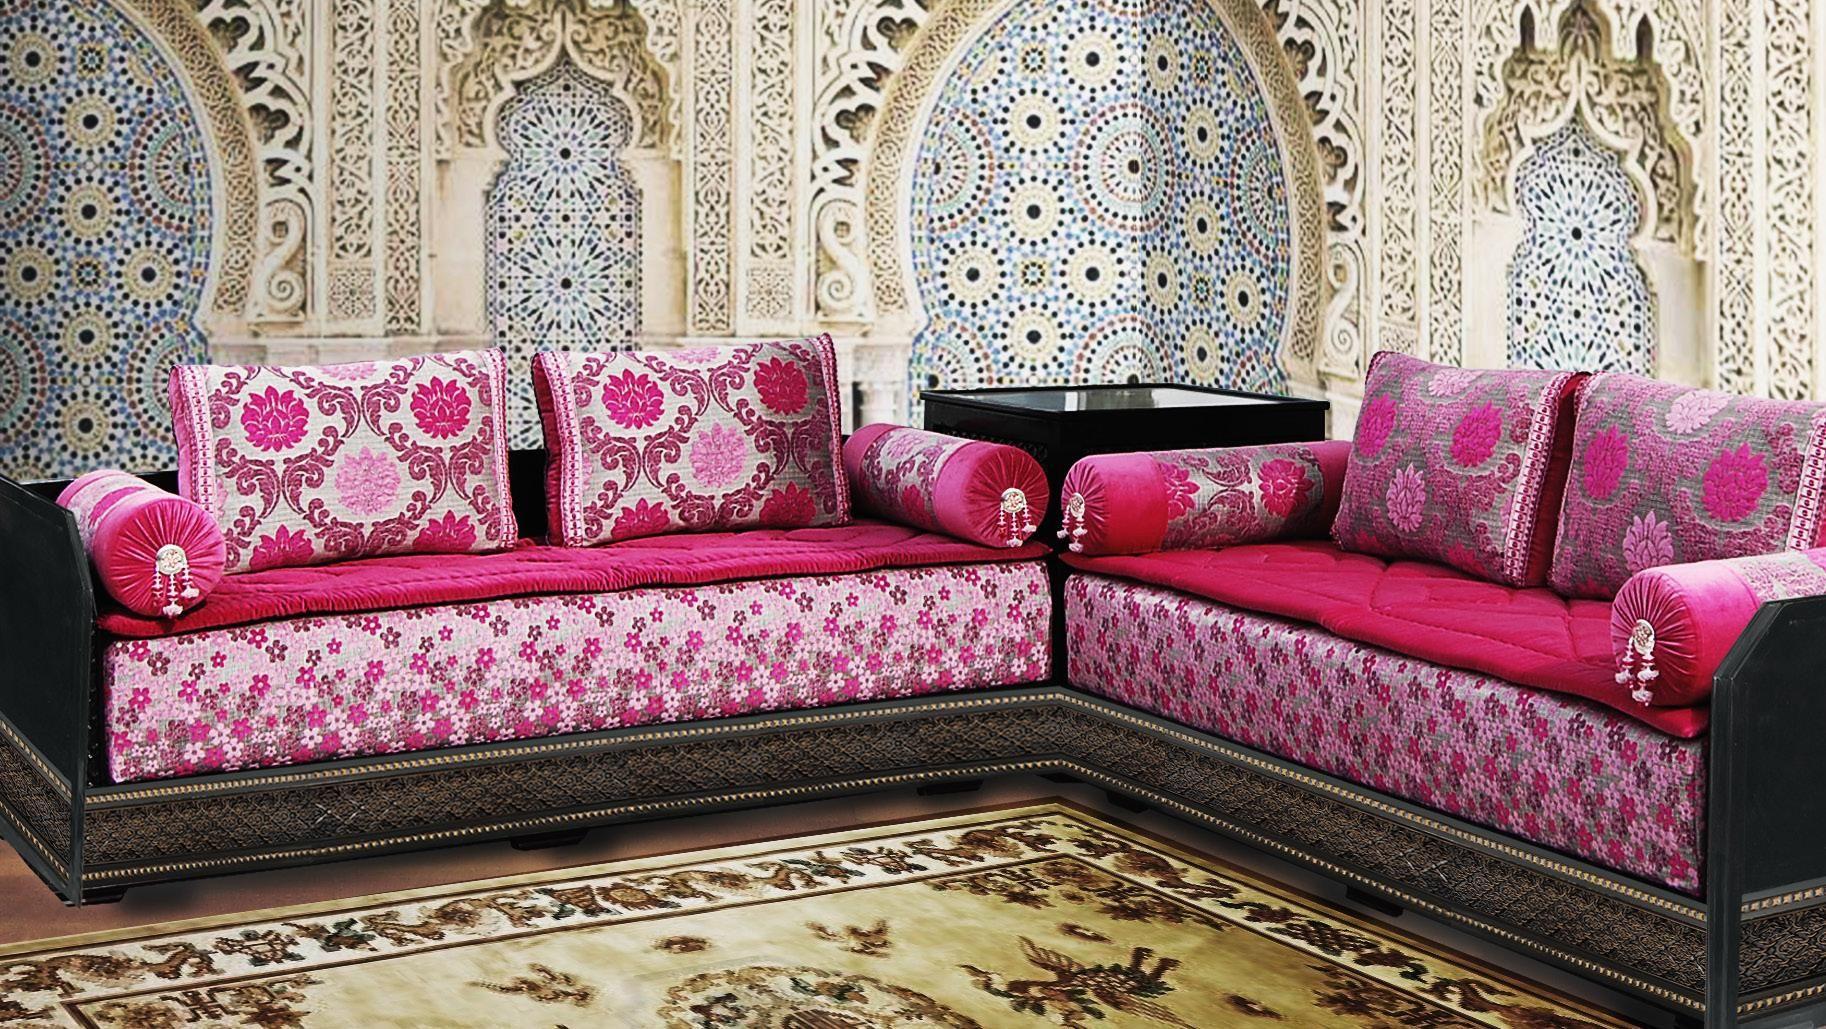 salon-arabesque | Salon marocain design, Salon marocain et ...